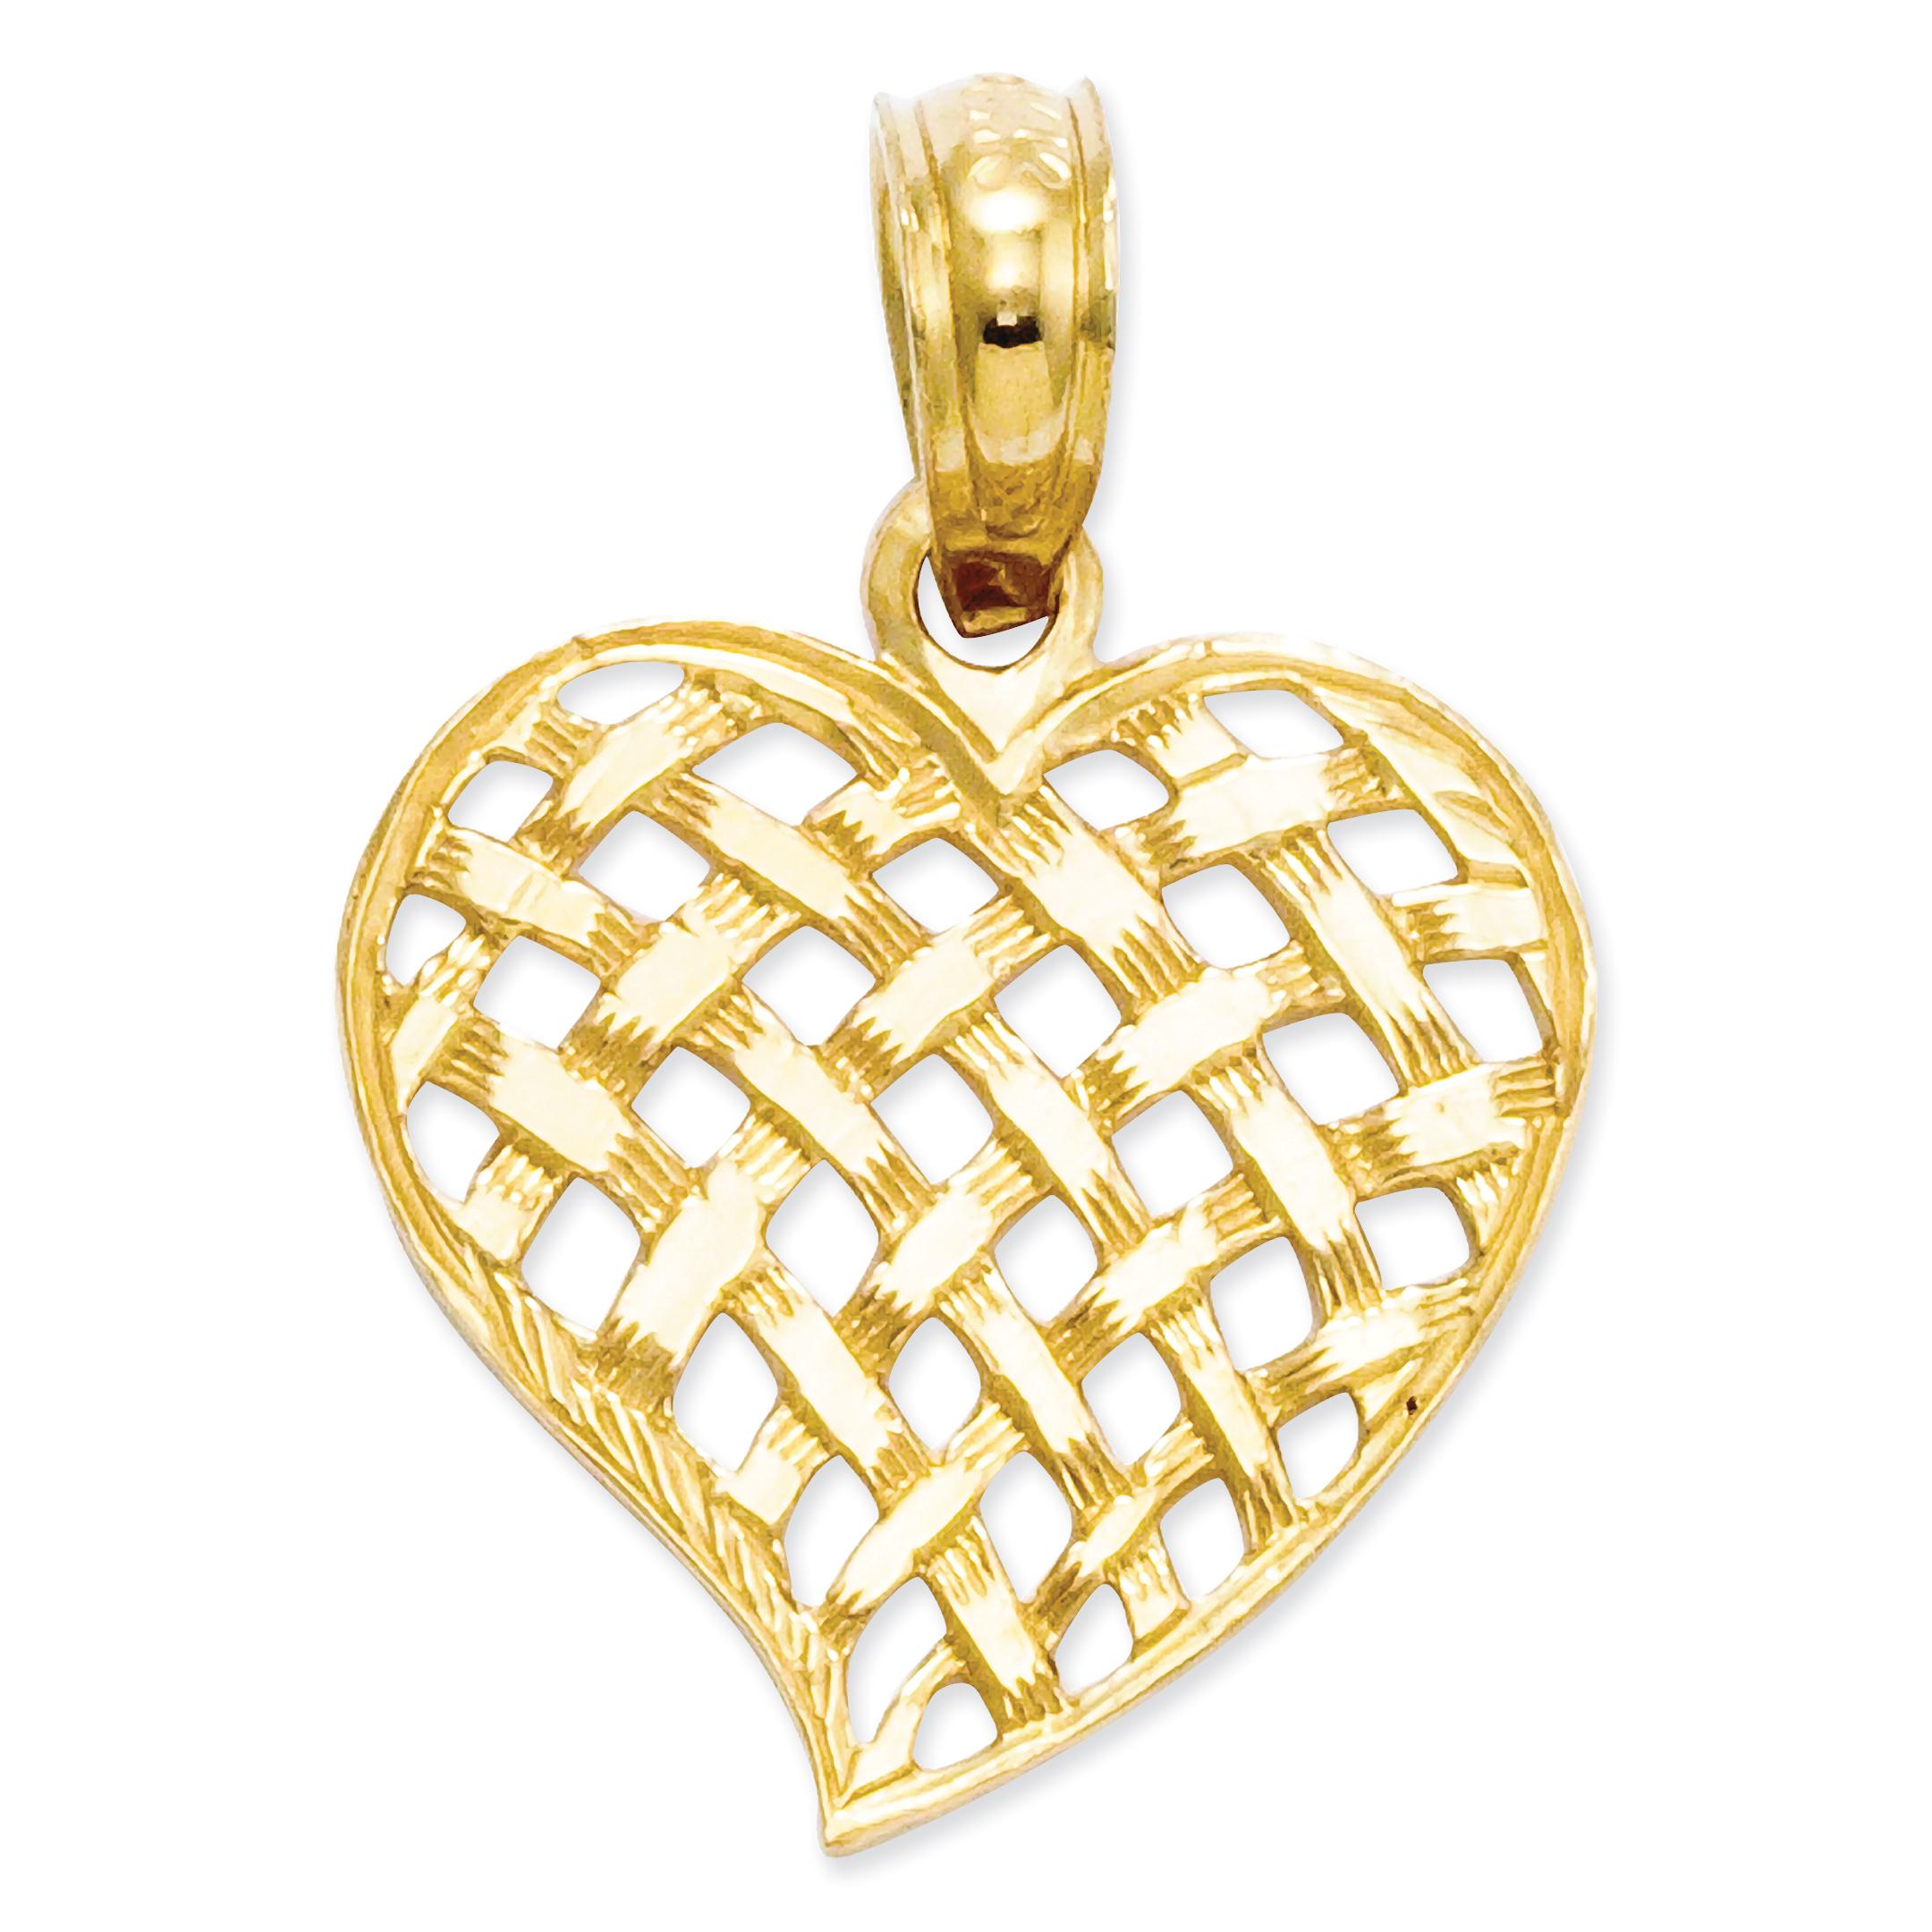 14K Yellow Gold Basket Weave Heart Pendant - image 2 de 2